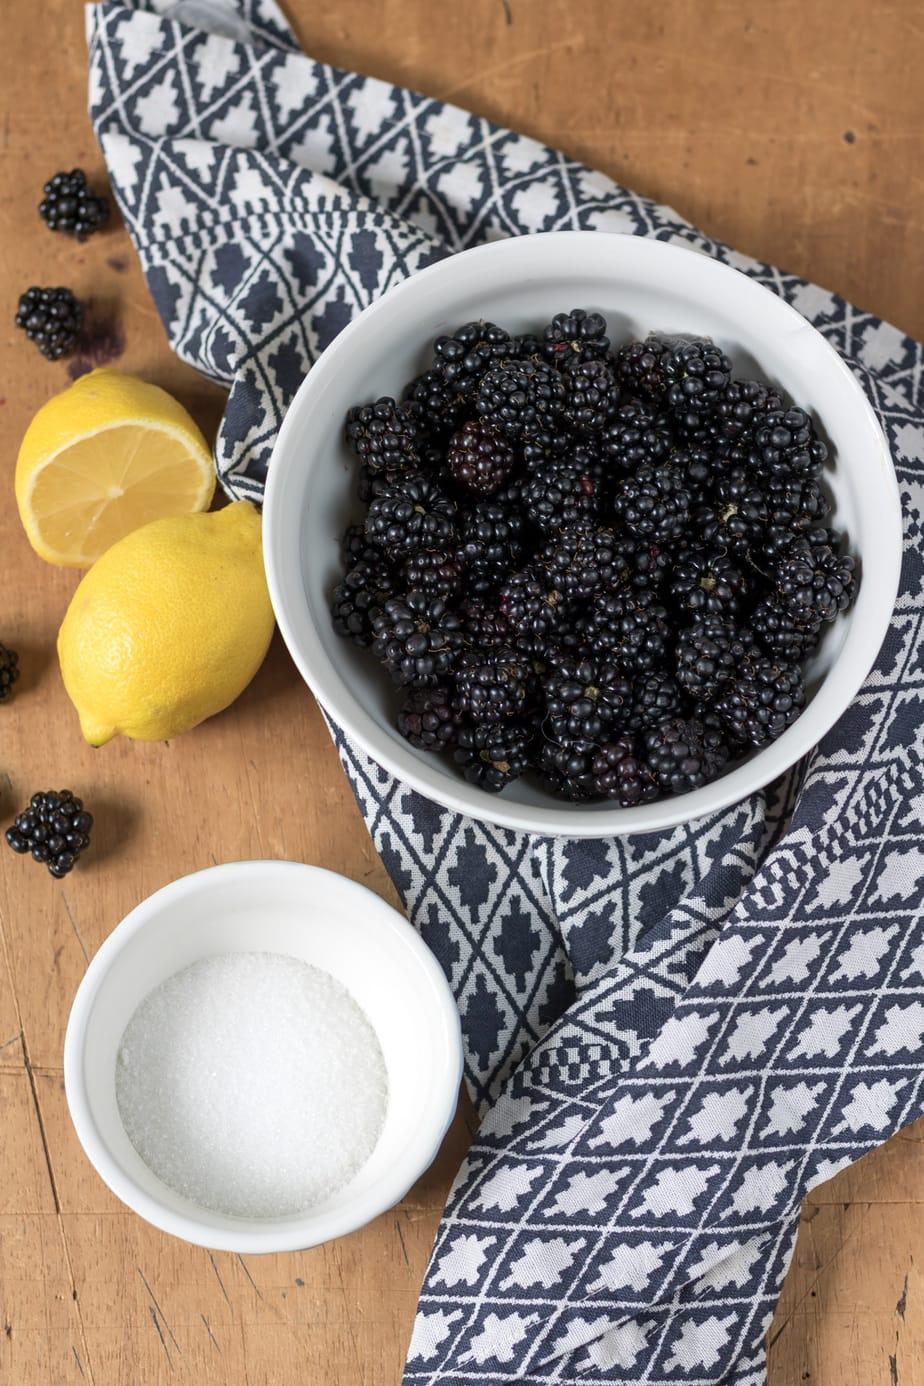 Table with blackberries, lemons and sugar.